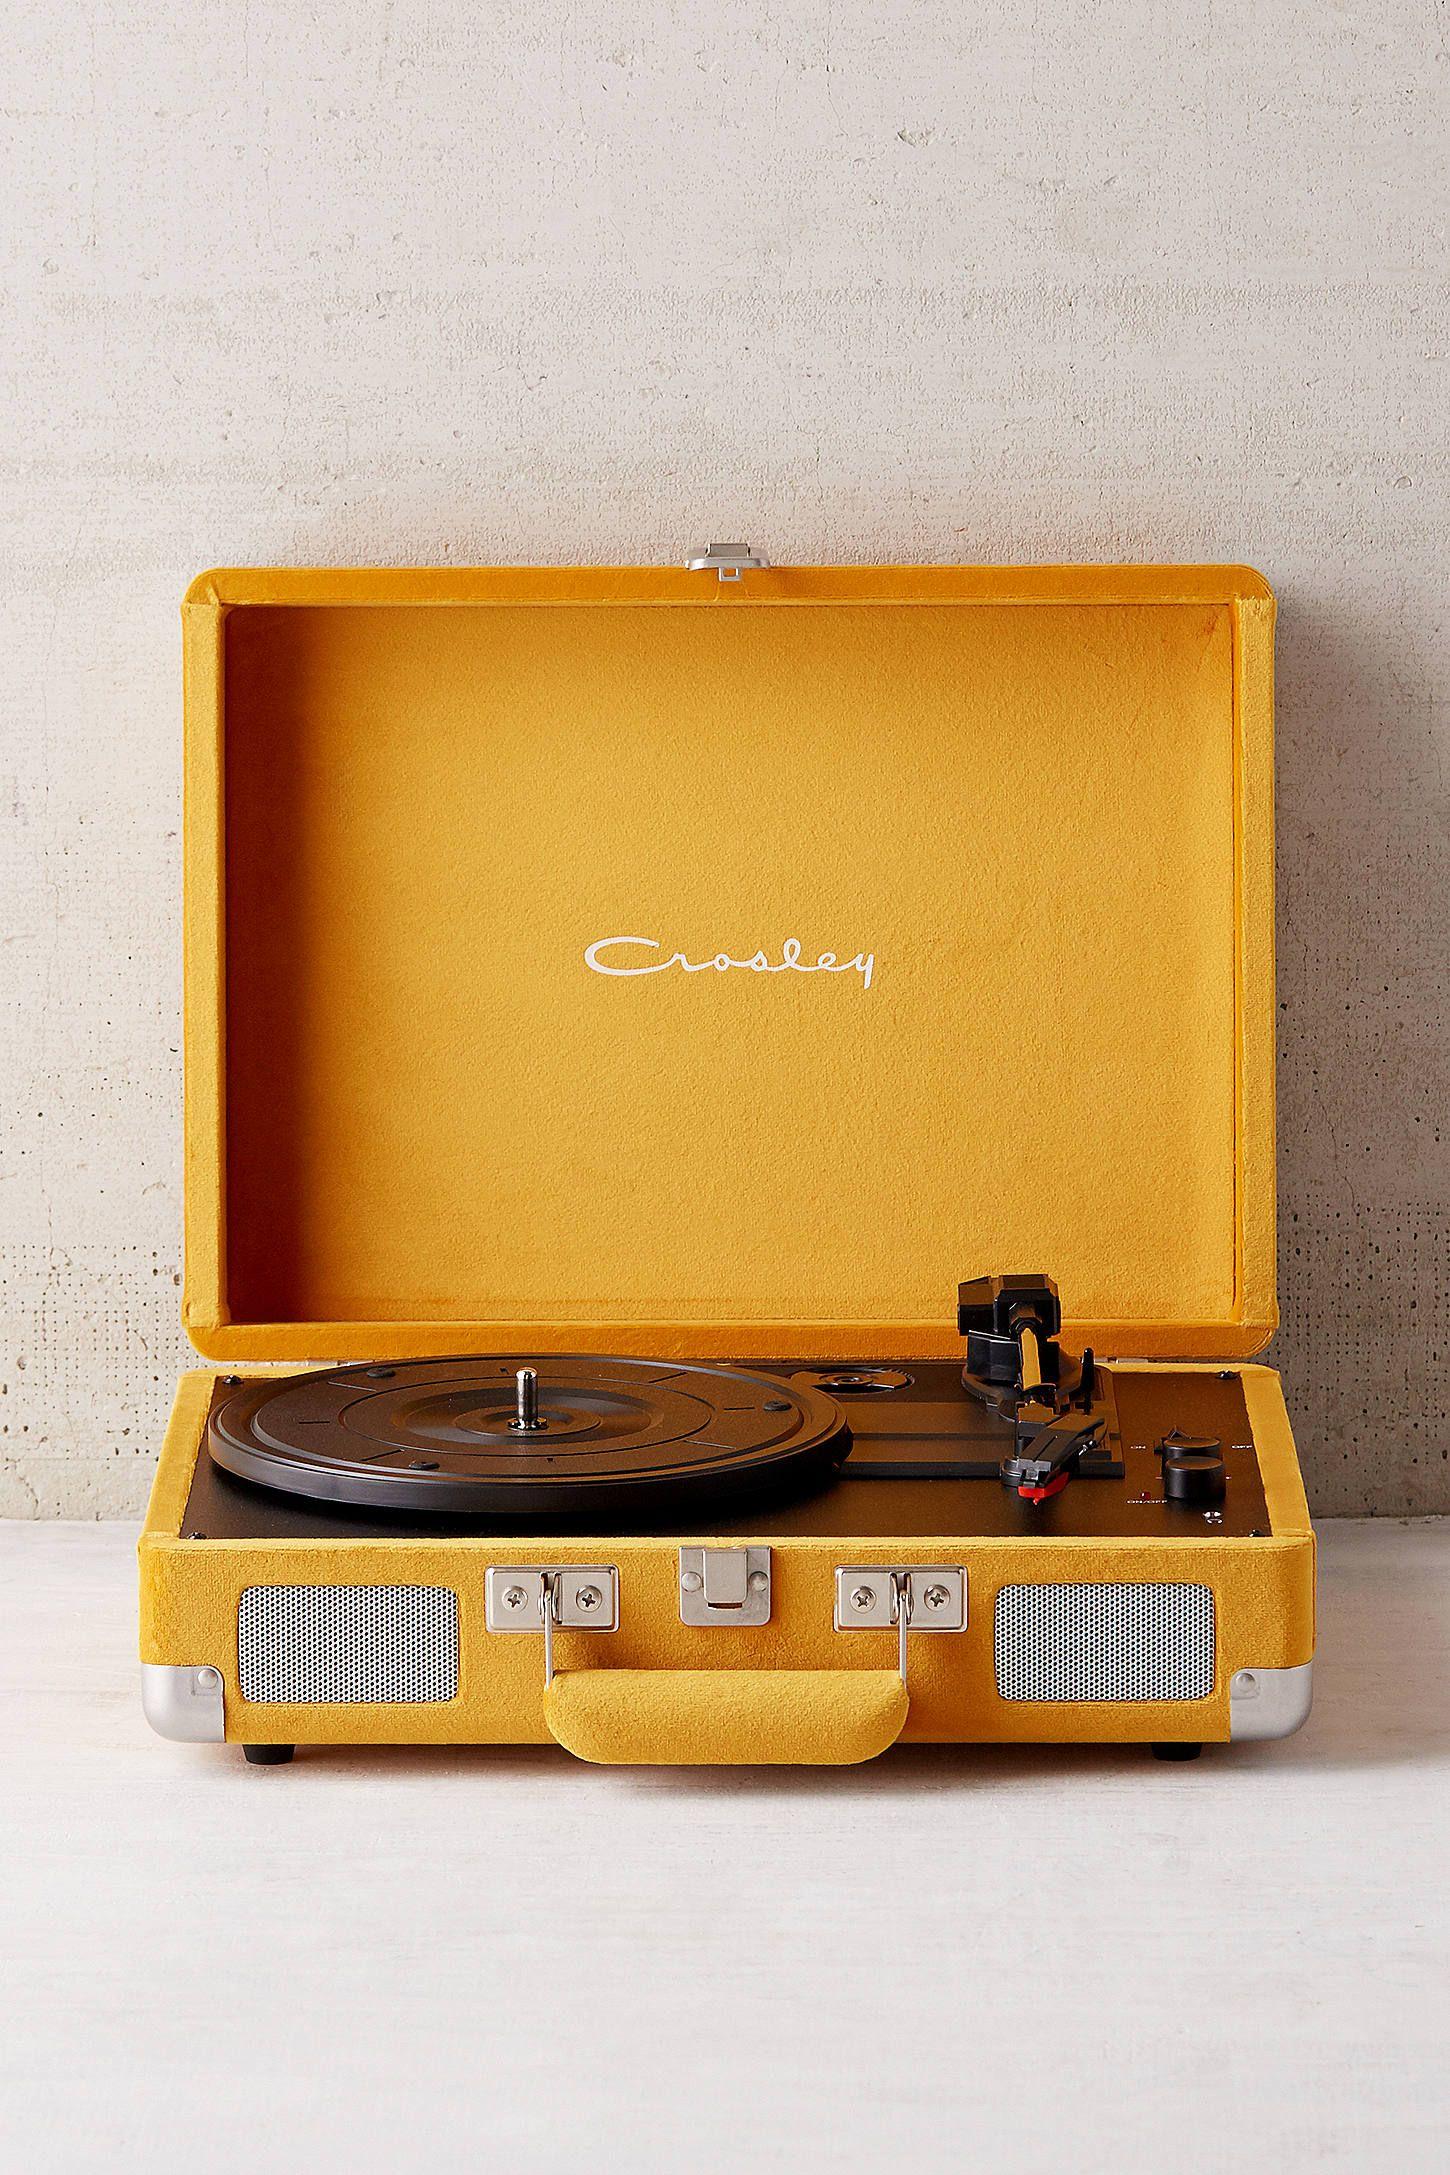 Crosley X Uo Mustard Velvet Cruiser Bluetooth Vinyl Record Player Yellow Aesthetic Pastel Yellow Aesthetic Bluetooth Record Player